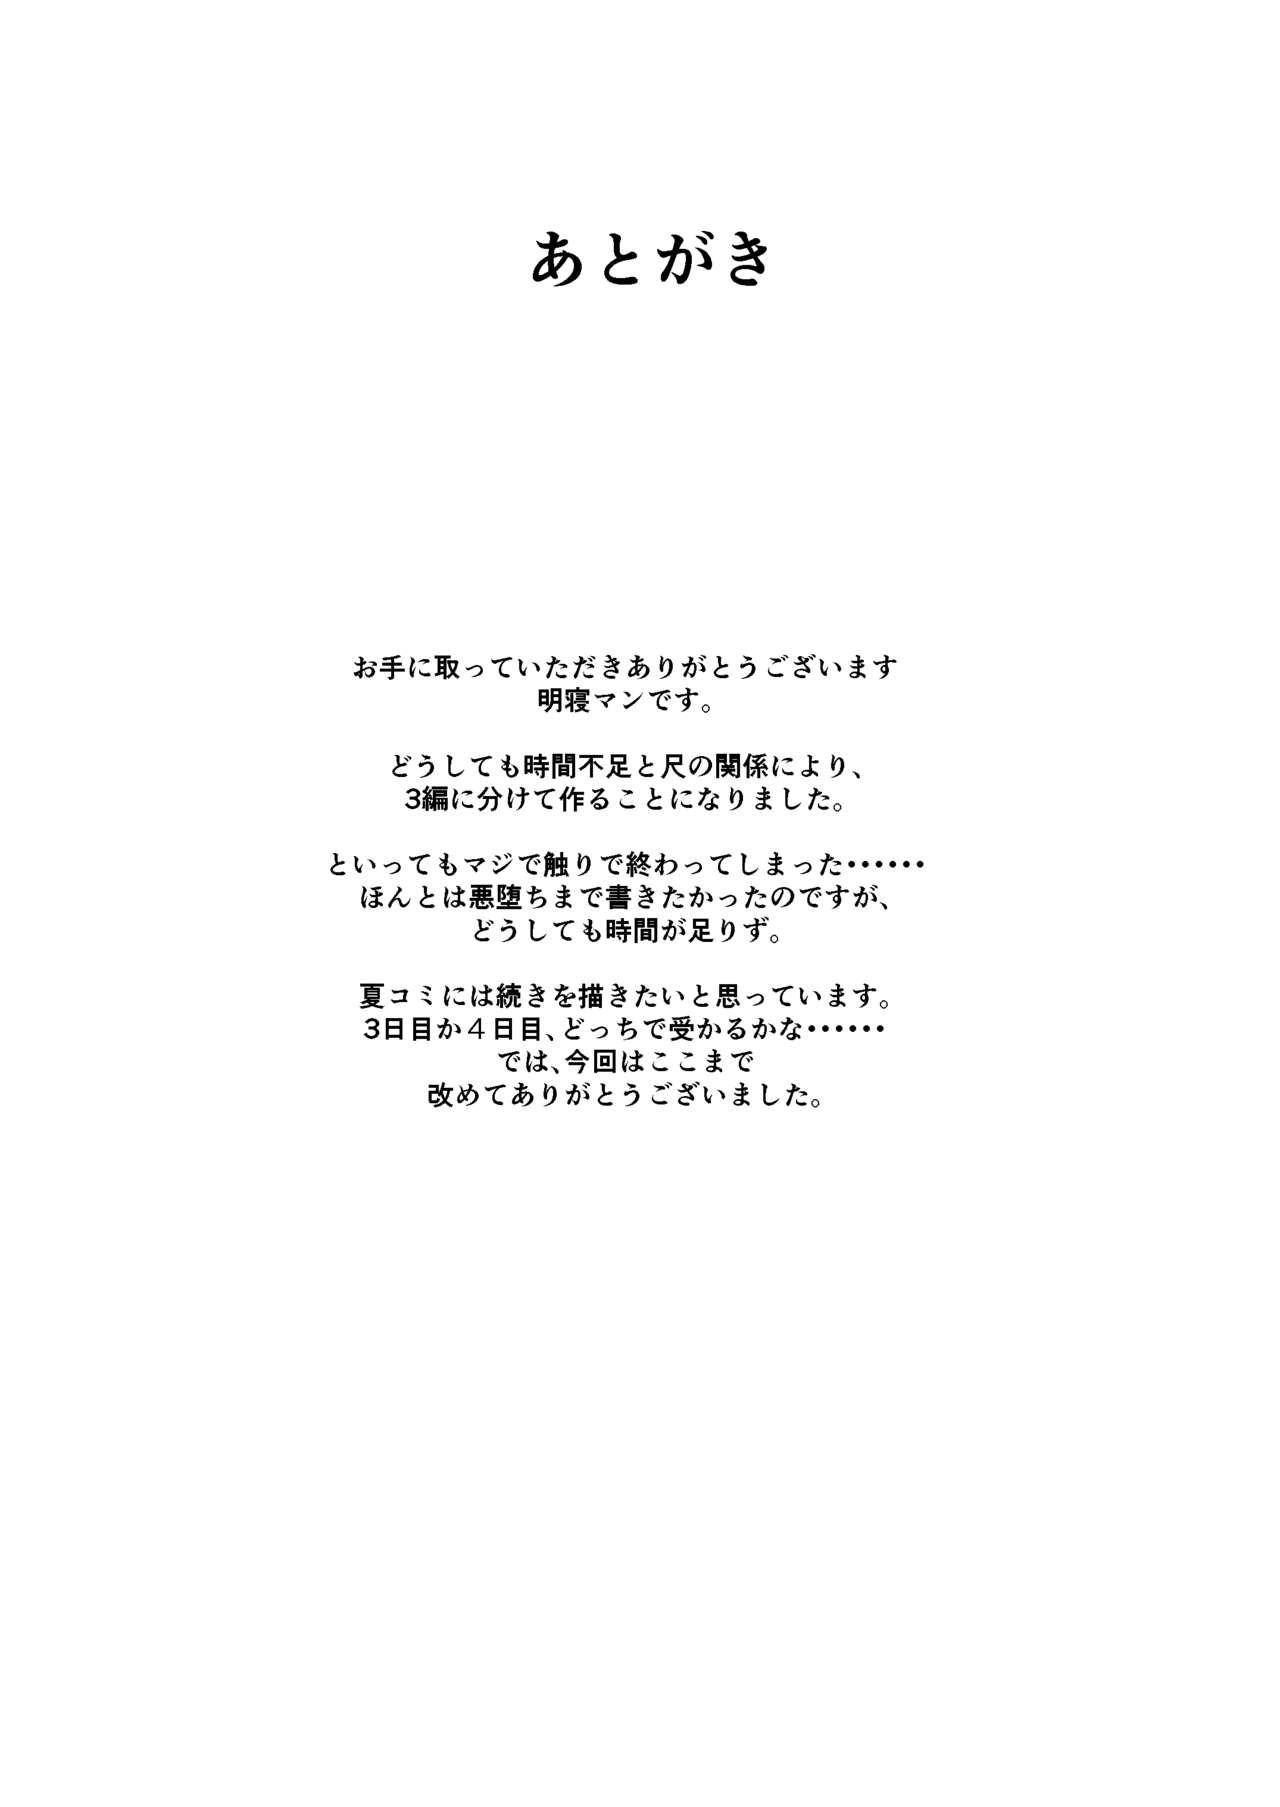 Masei Shoujo Pure Liebe Jo 15